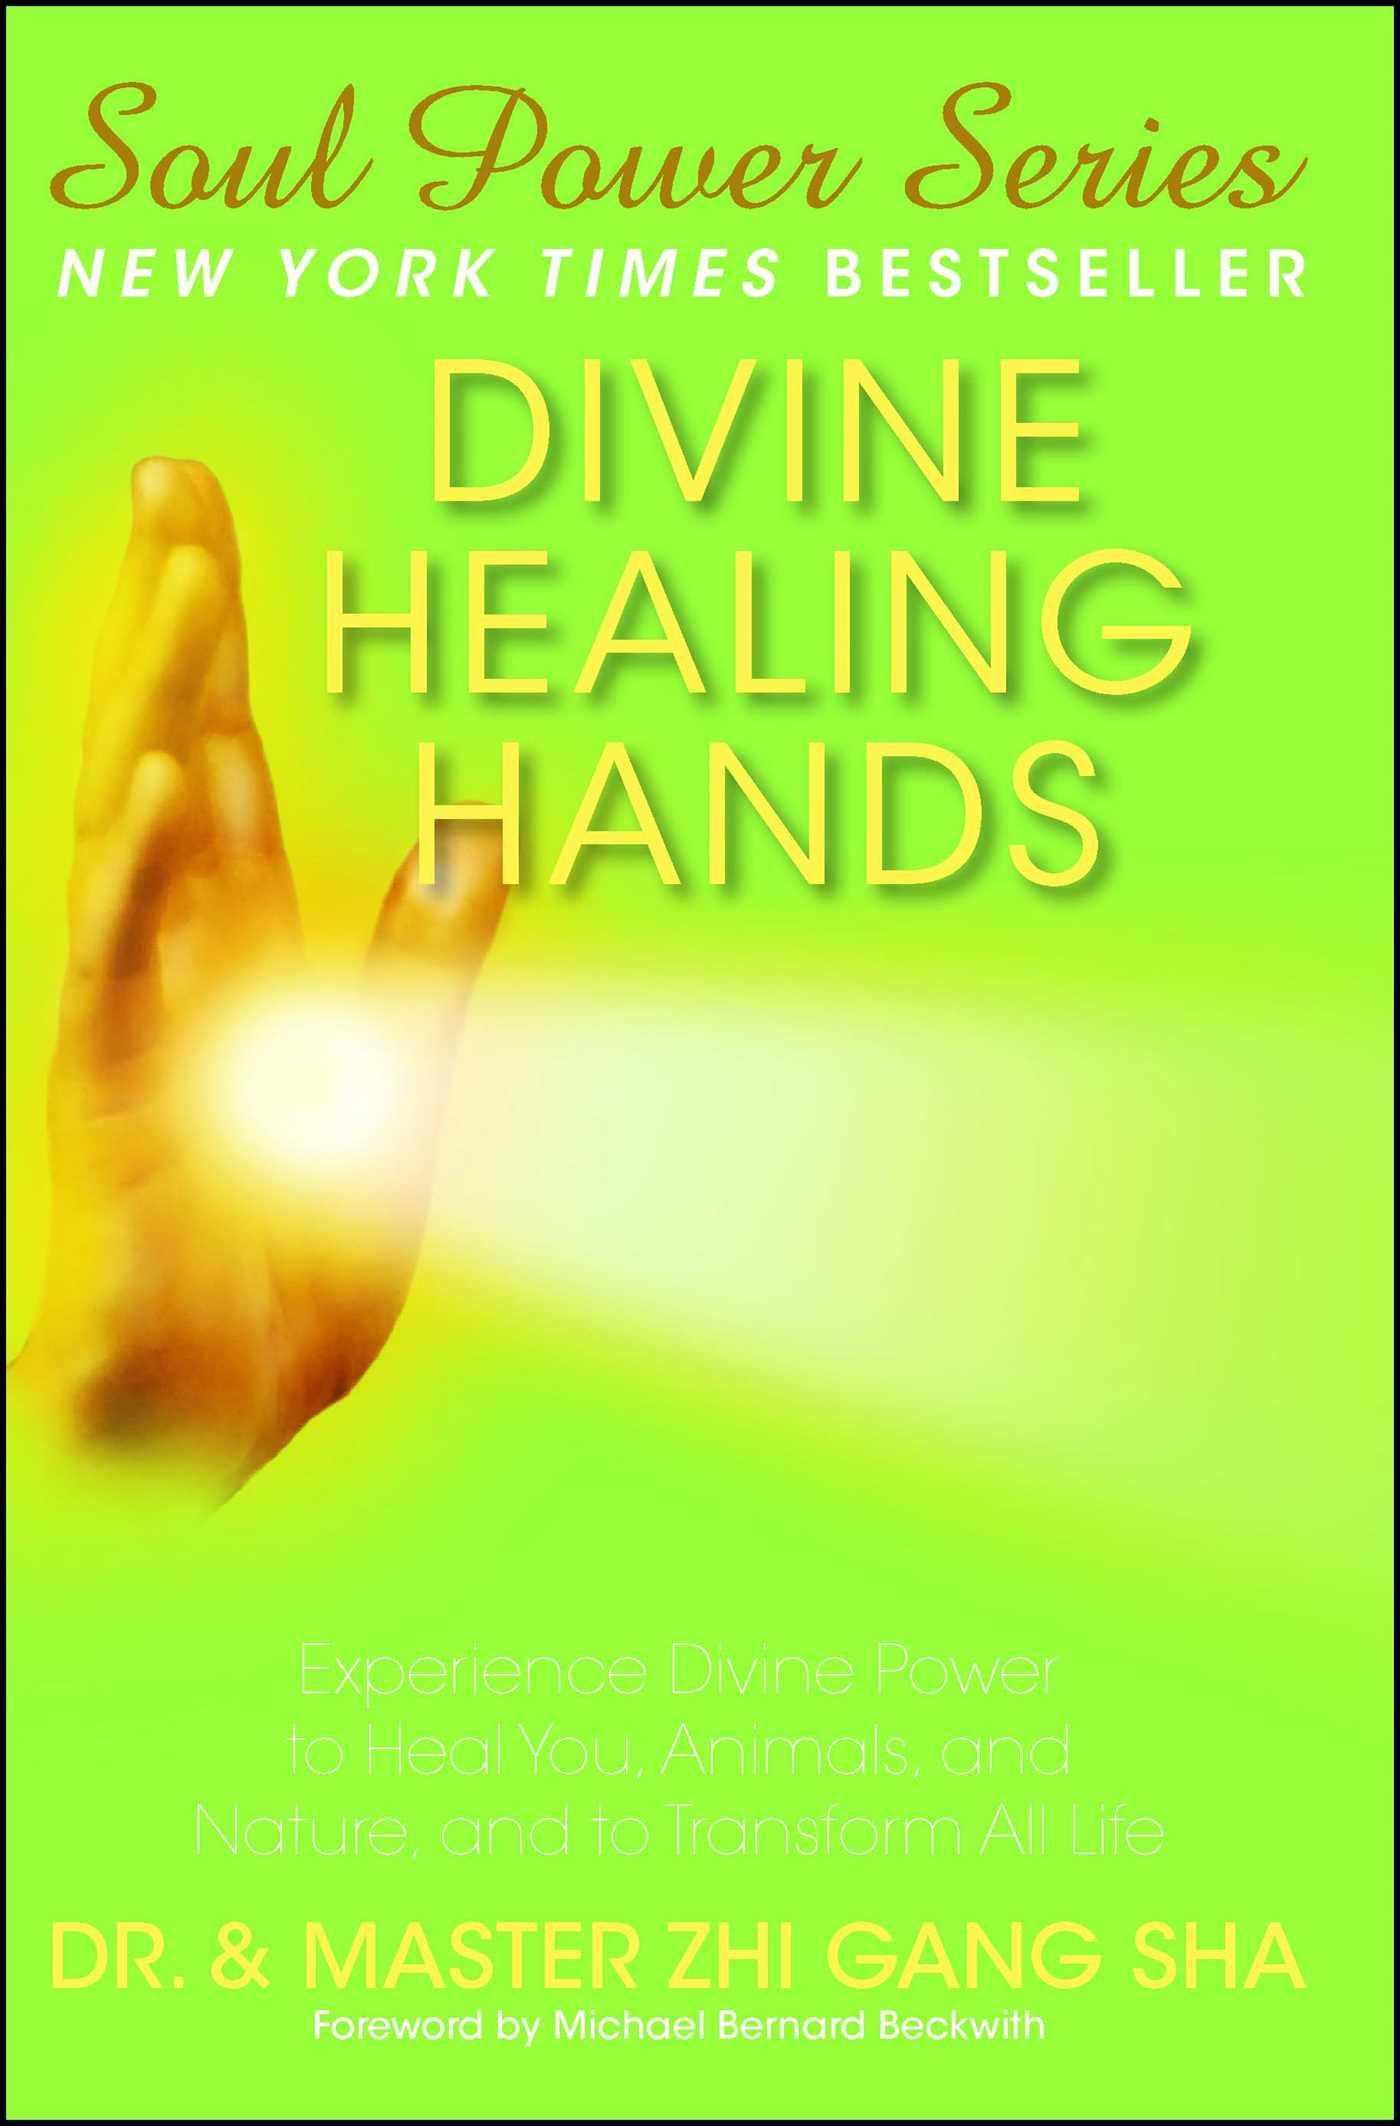 Divine healing hands 9781476714431 hr